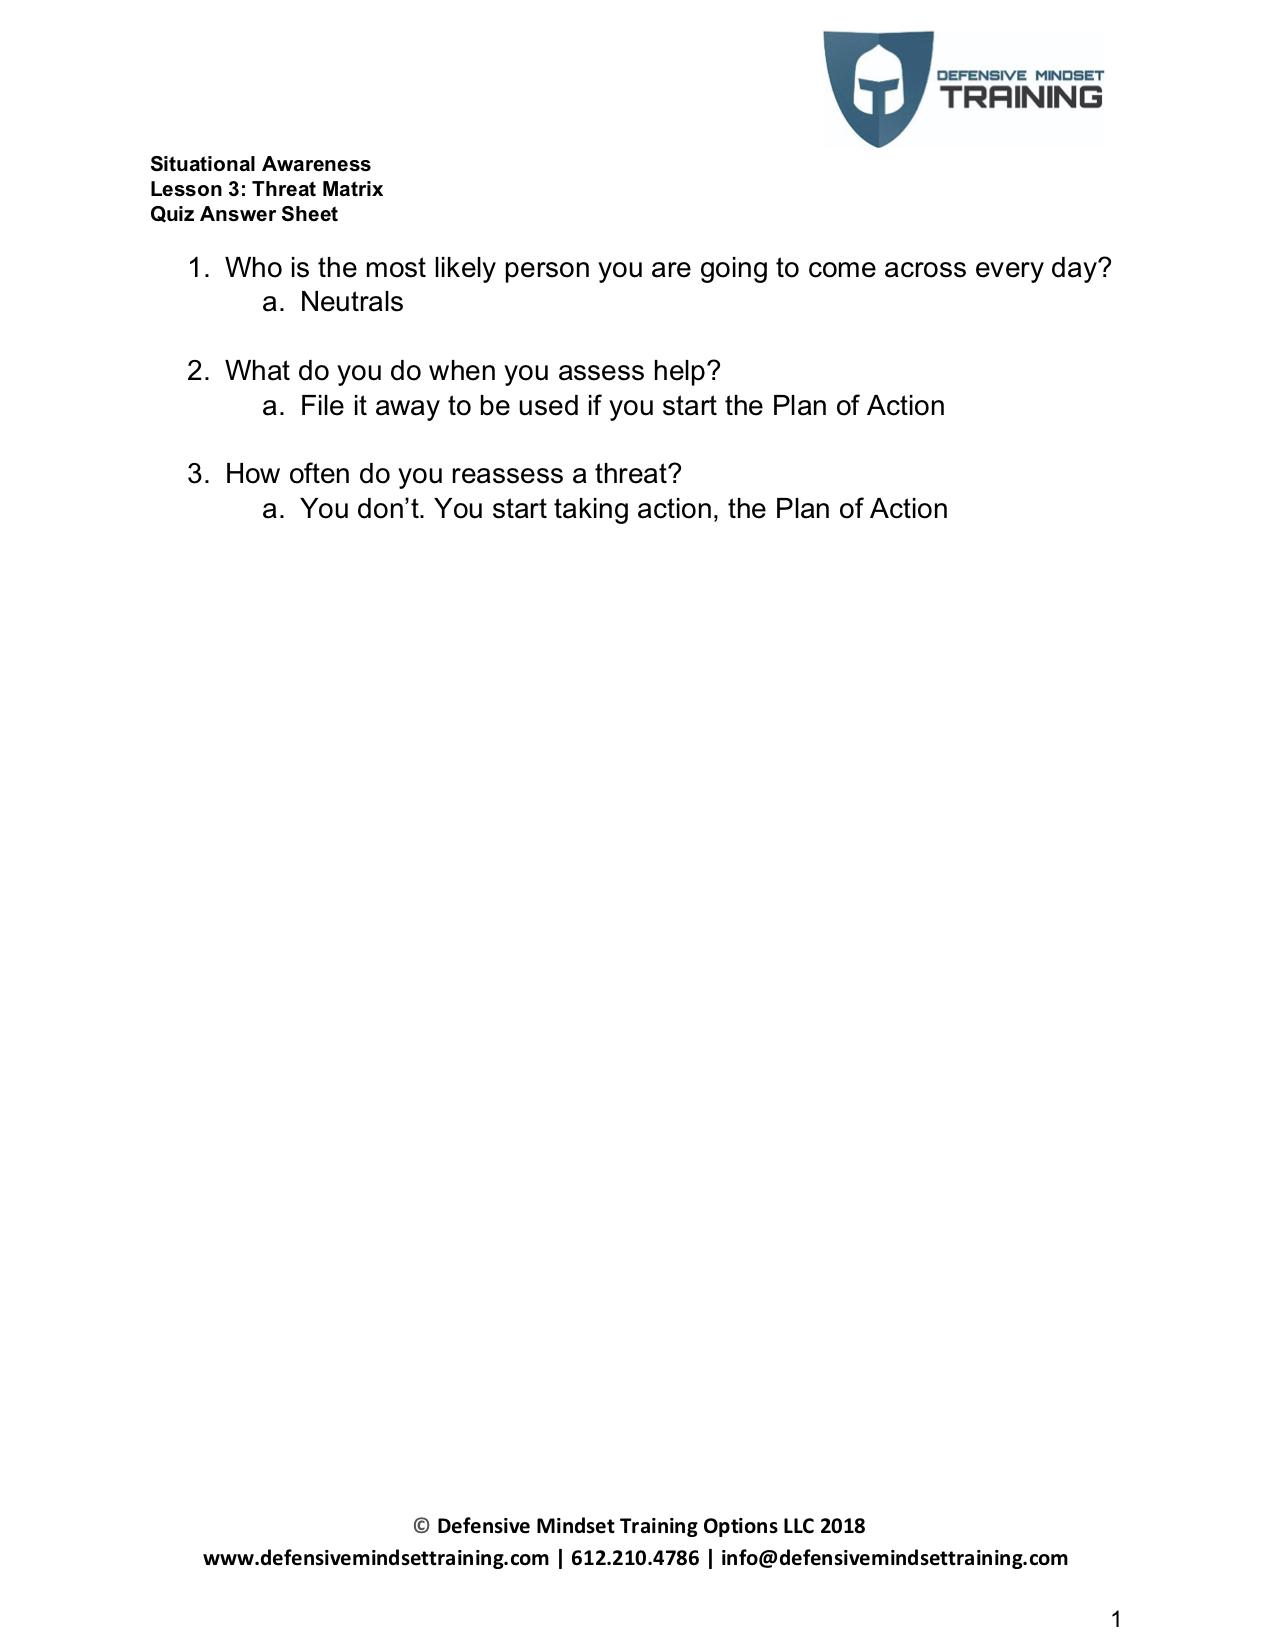 SA L3 - Threat Matrix - Quiz Answer Sheet.jpg